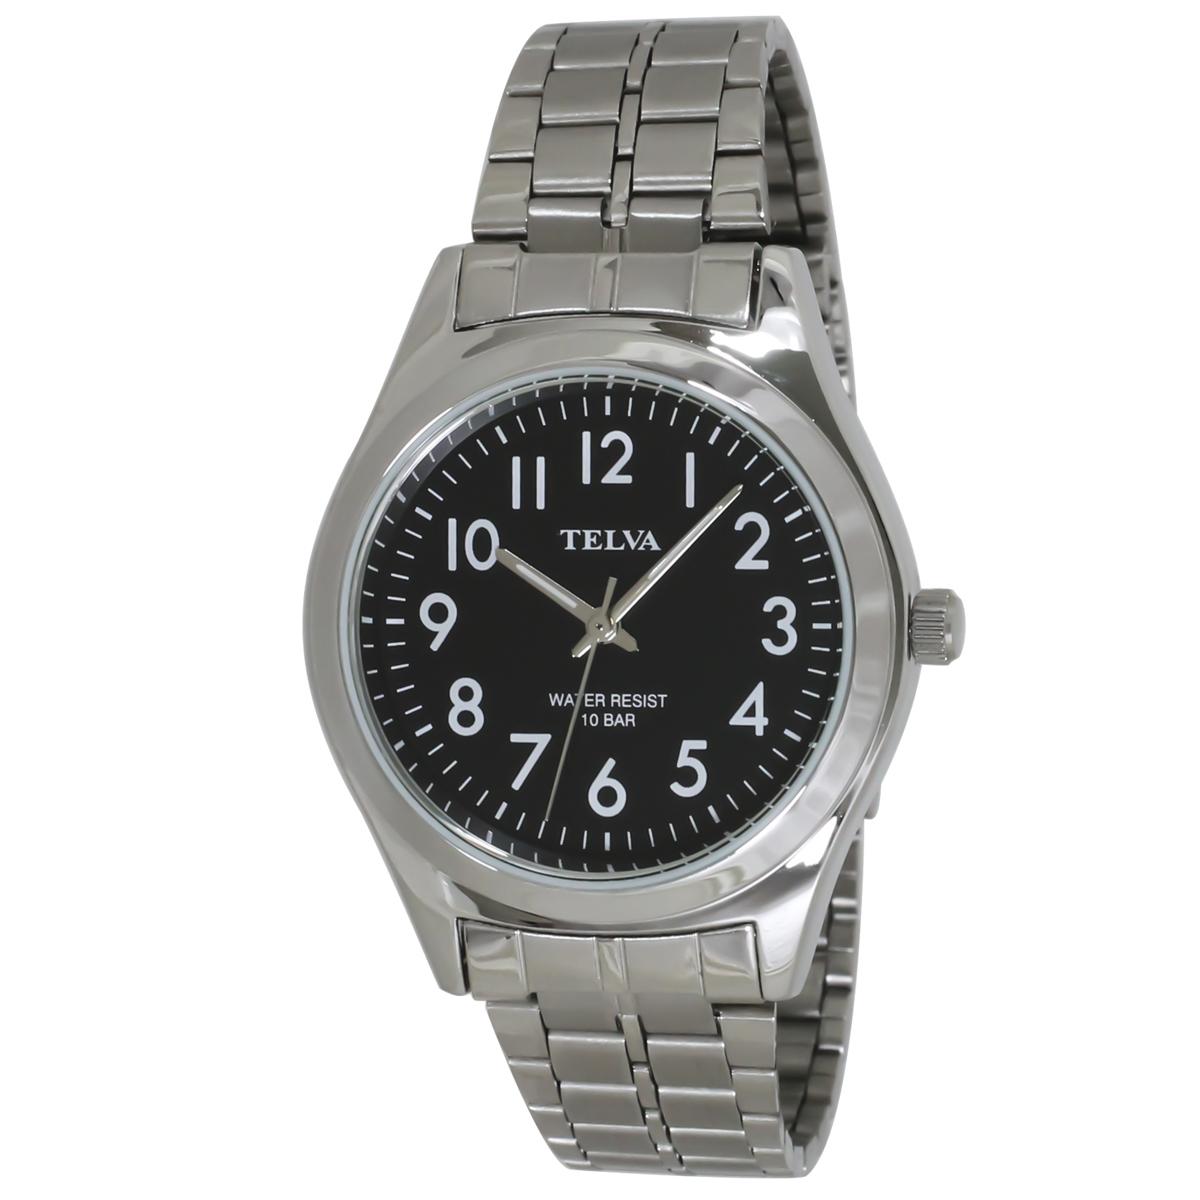 TELVA テルバ アナログウオッチ メンズ 10気圧防水 腕時計【TE-AM010】